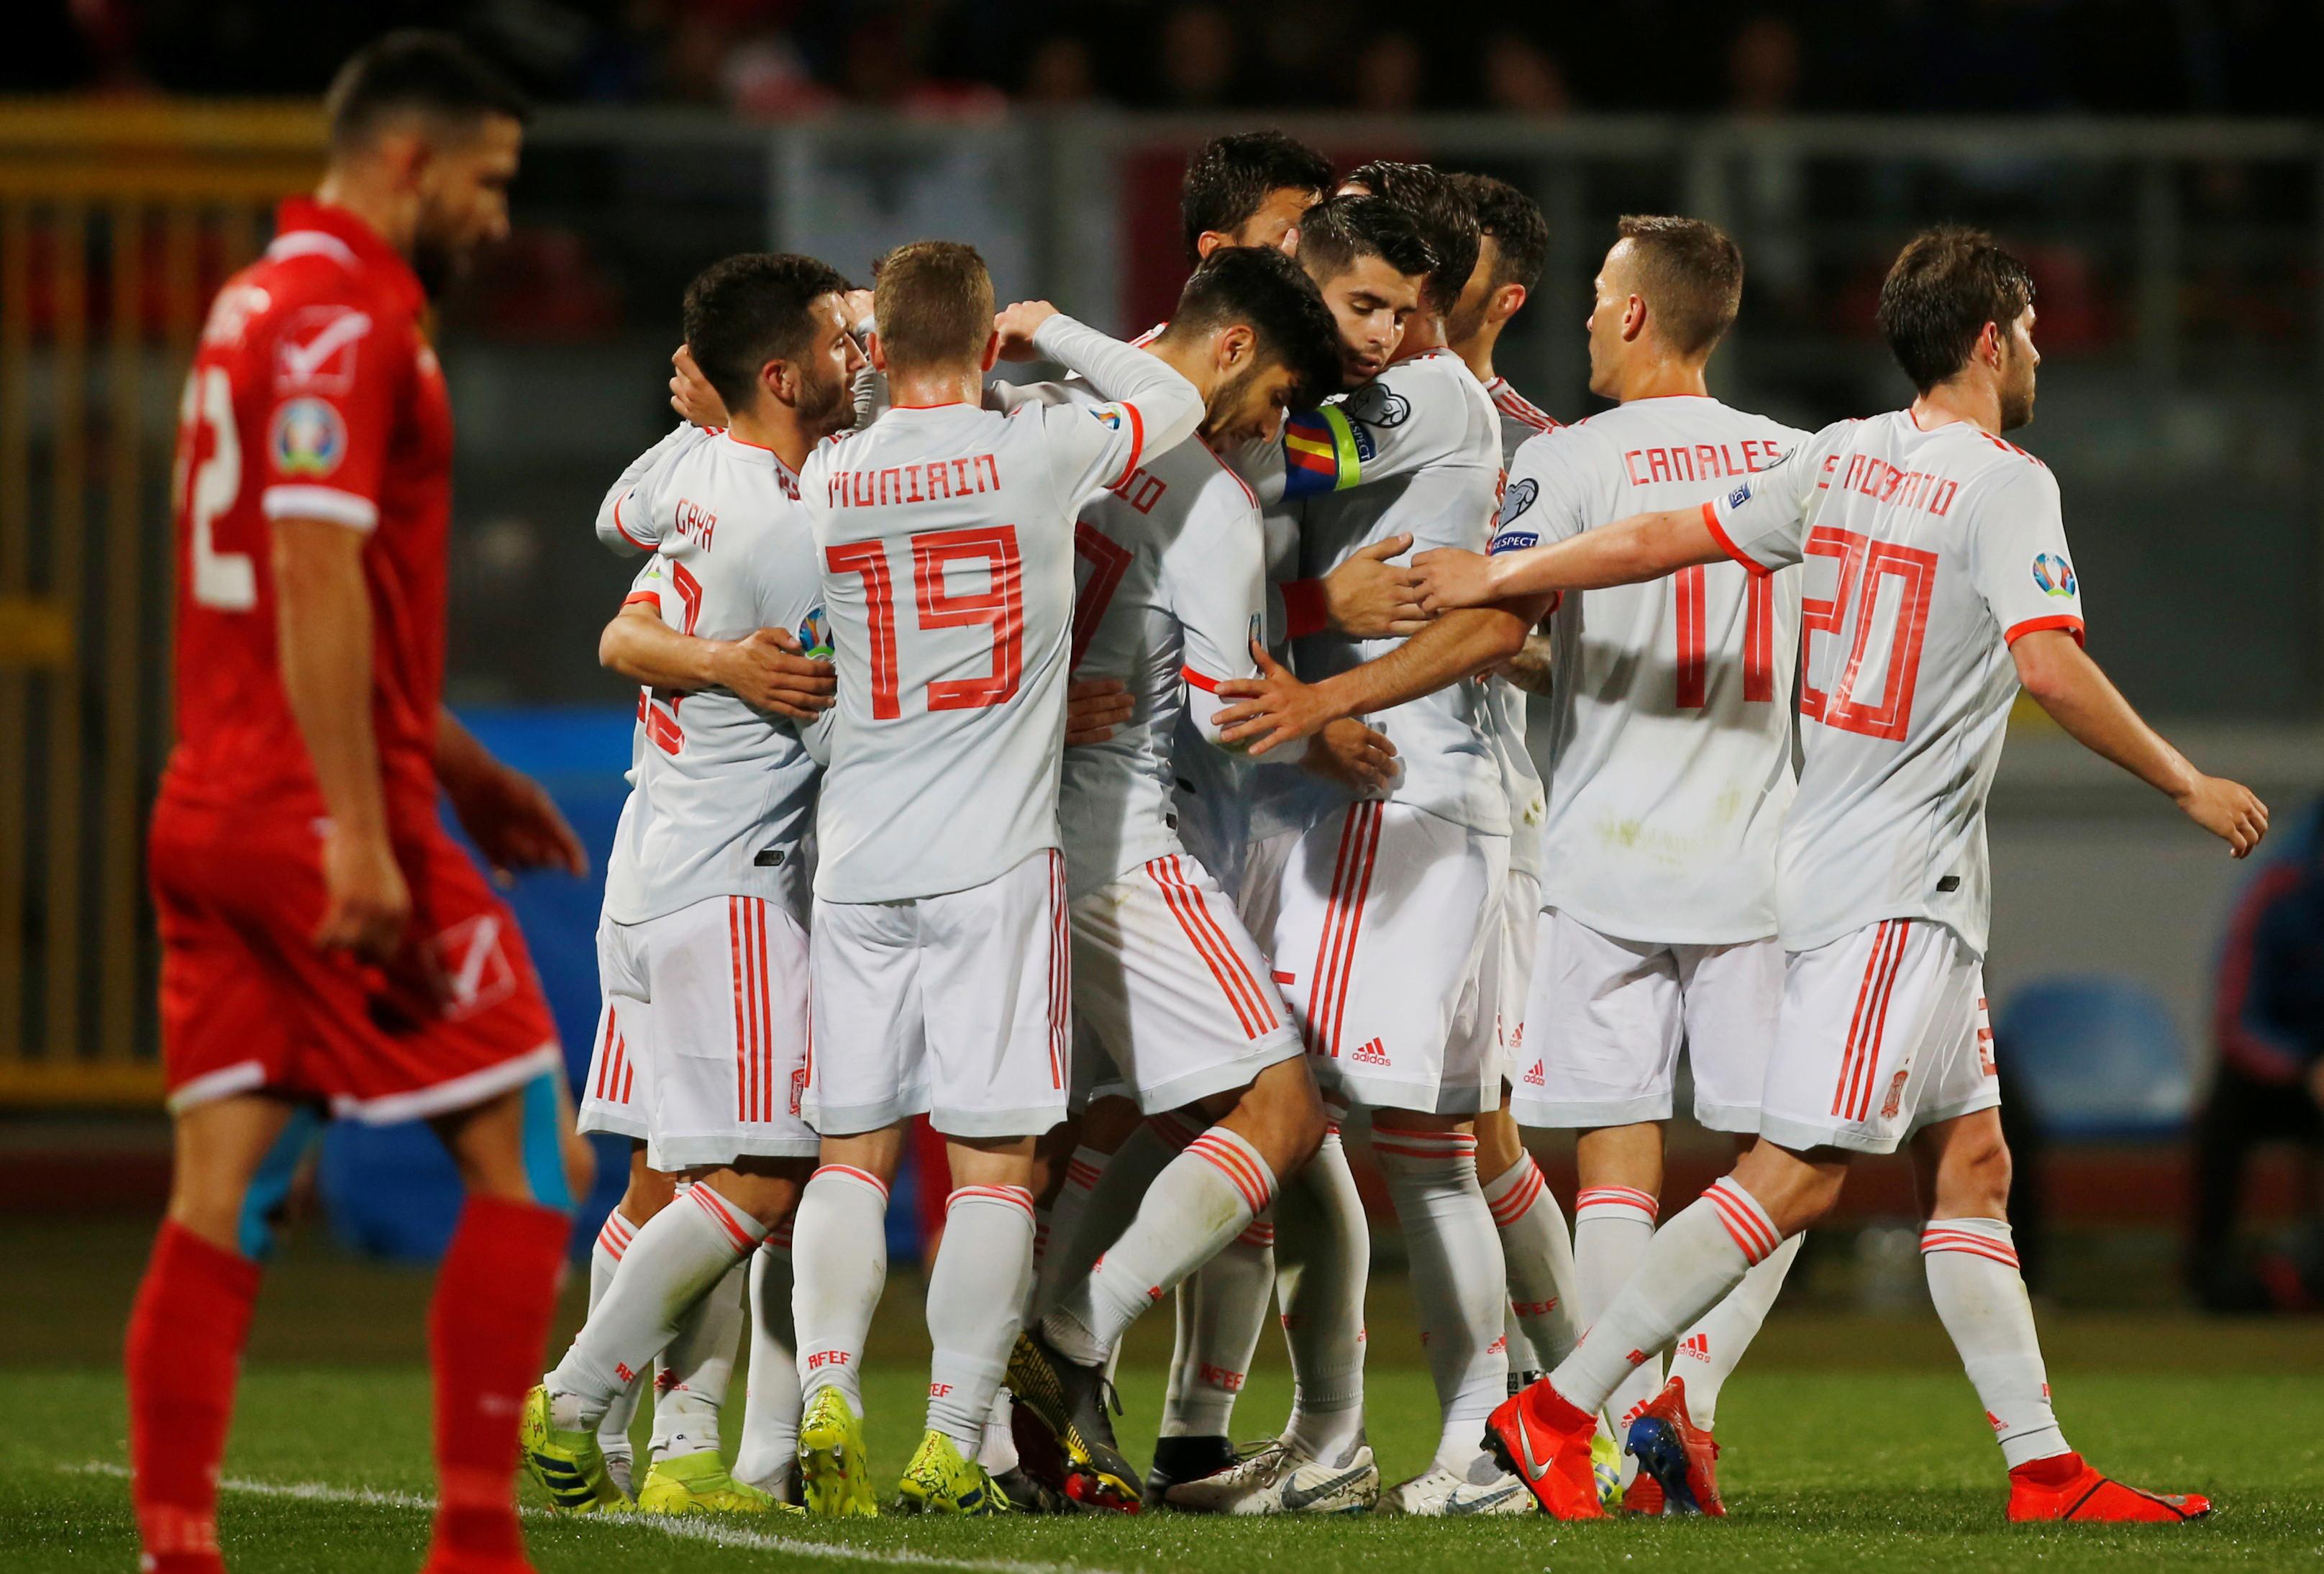 Espanha vence em Malta. Itália 'humilha' Liechtenstein